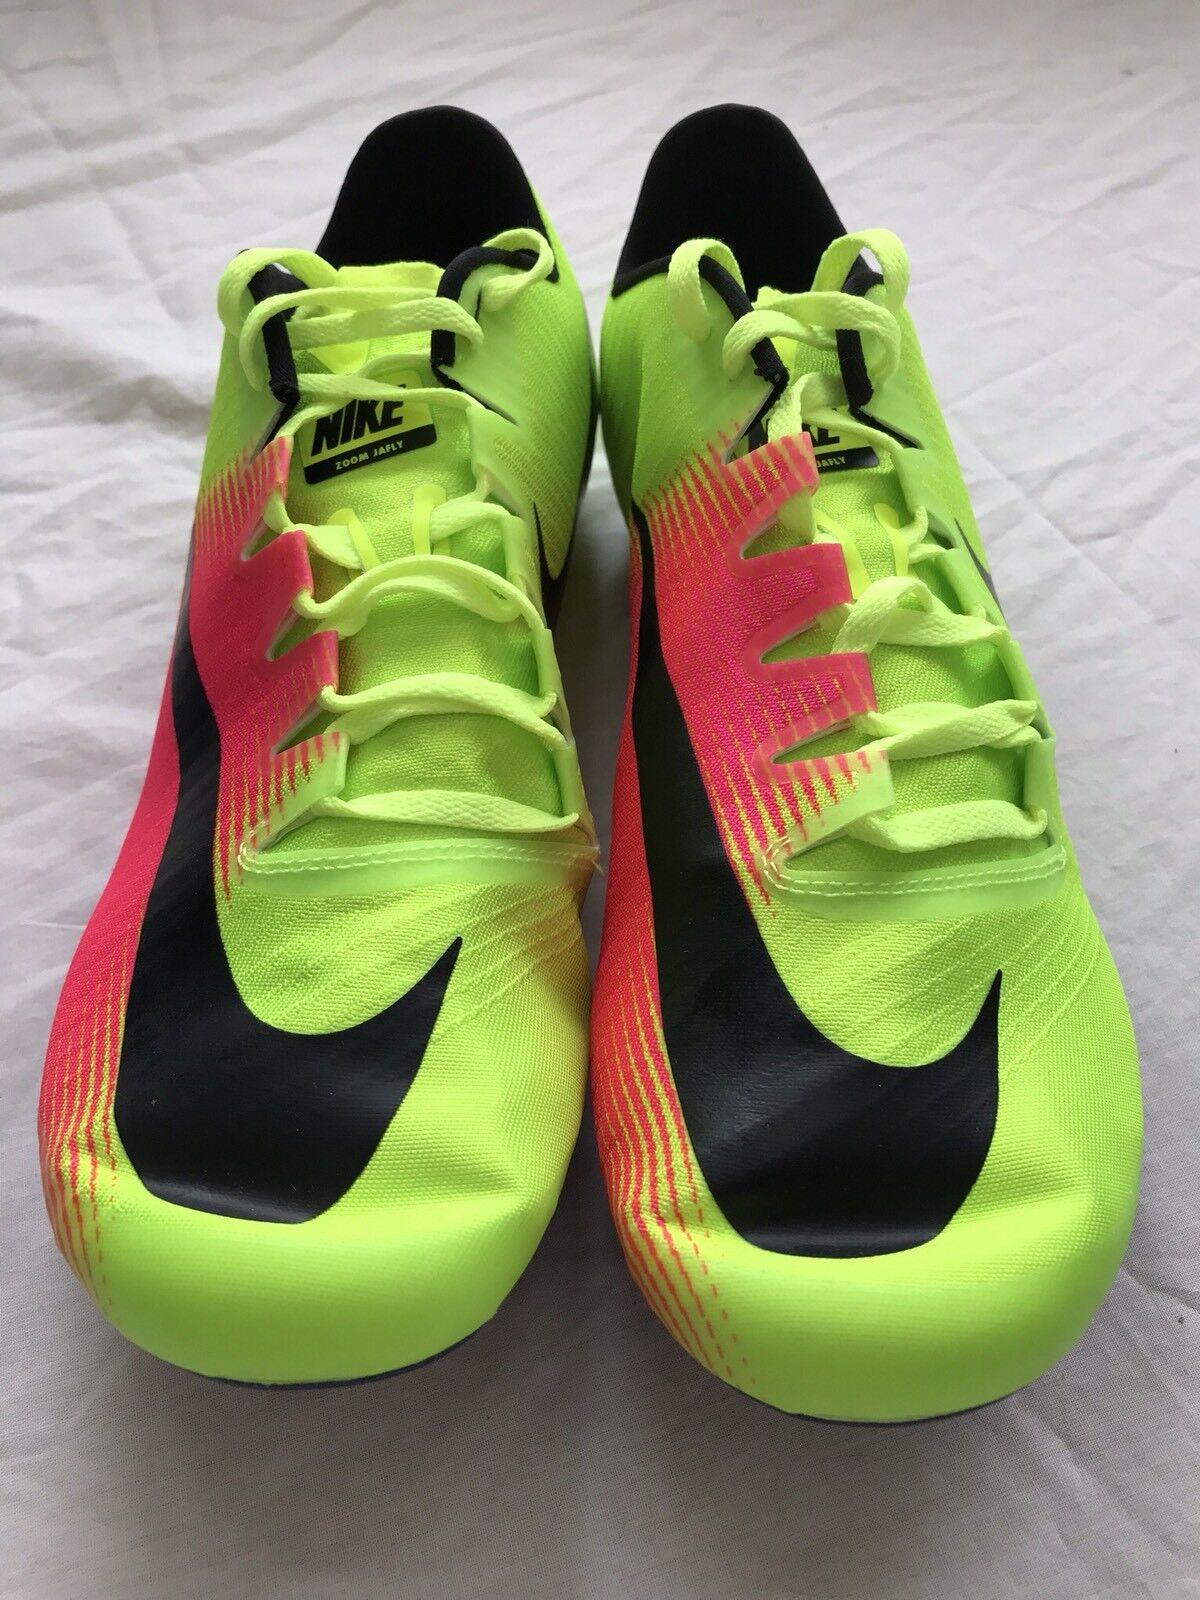 Nike Zoom JA FLY 3 OC Rio Track & Field Spikes Men's 882032-999 Sz. 11